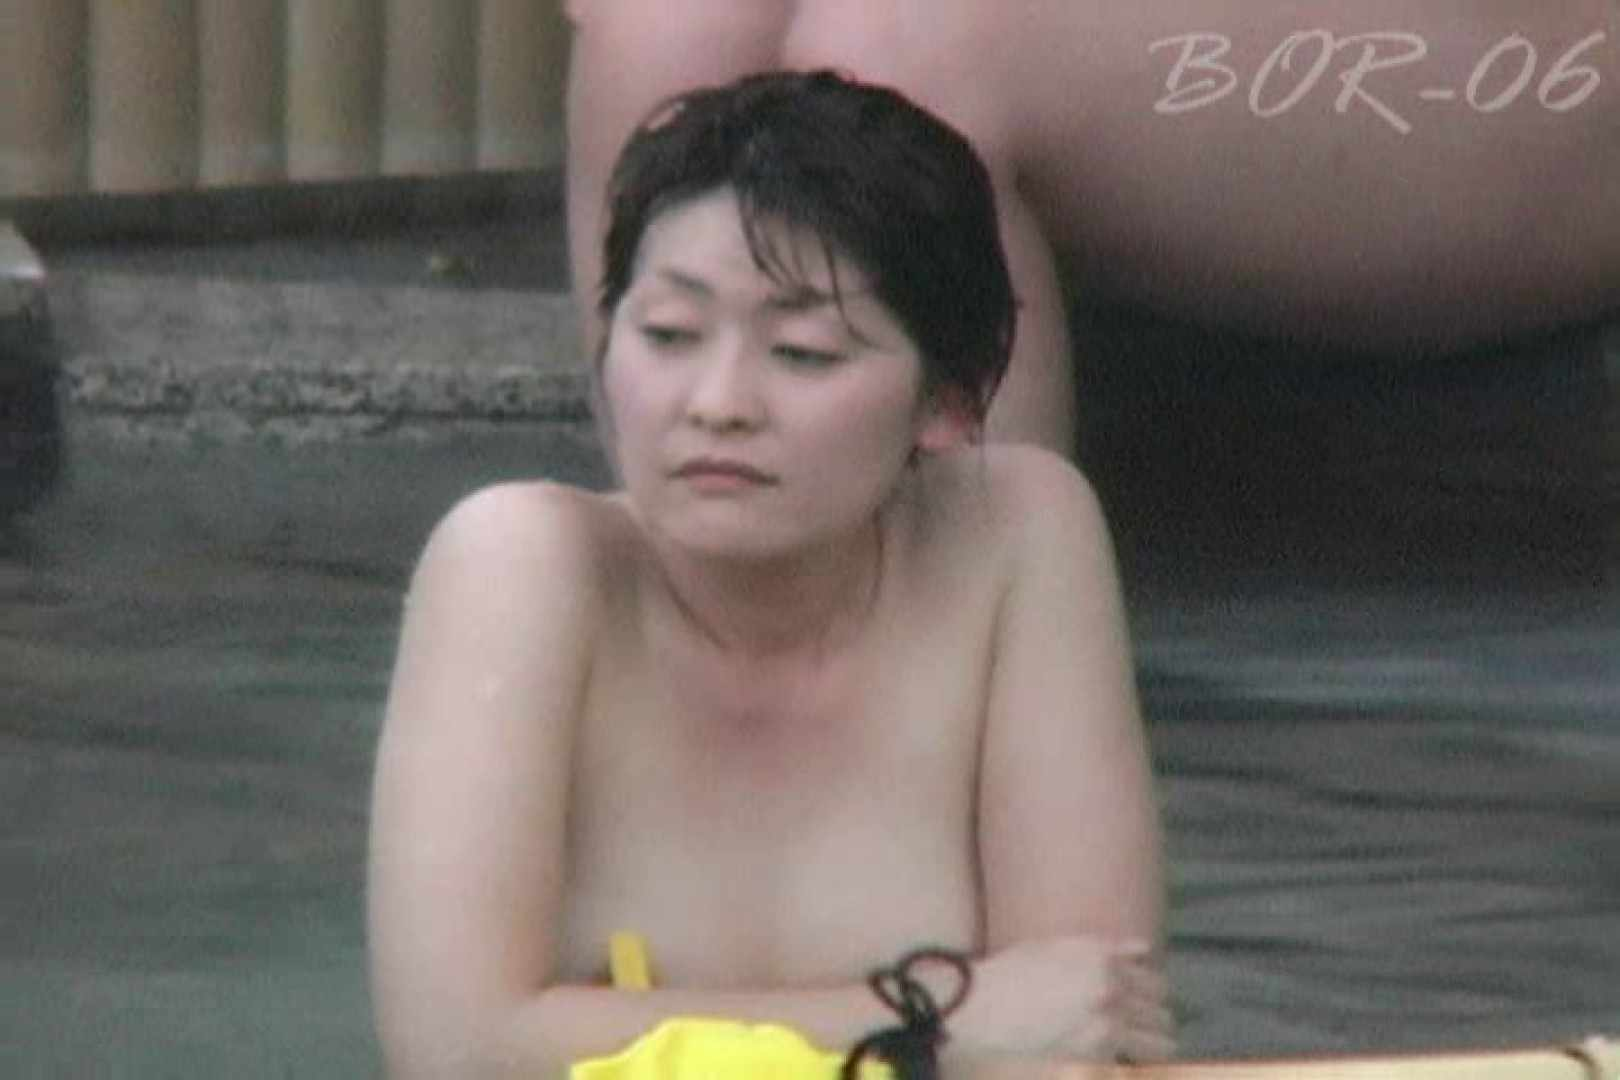 Aquaな露天風呂Vol.523 0 | 0  52連発 15